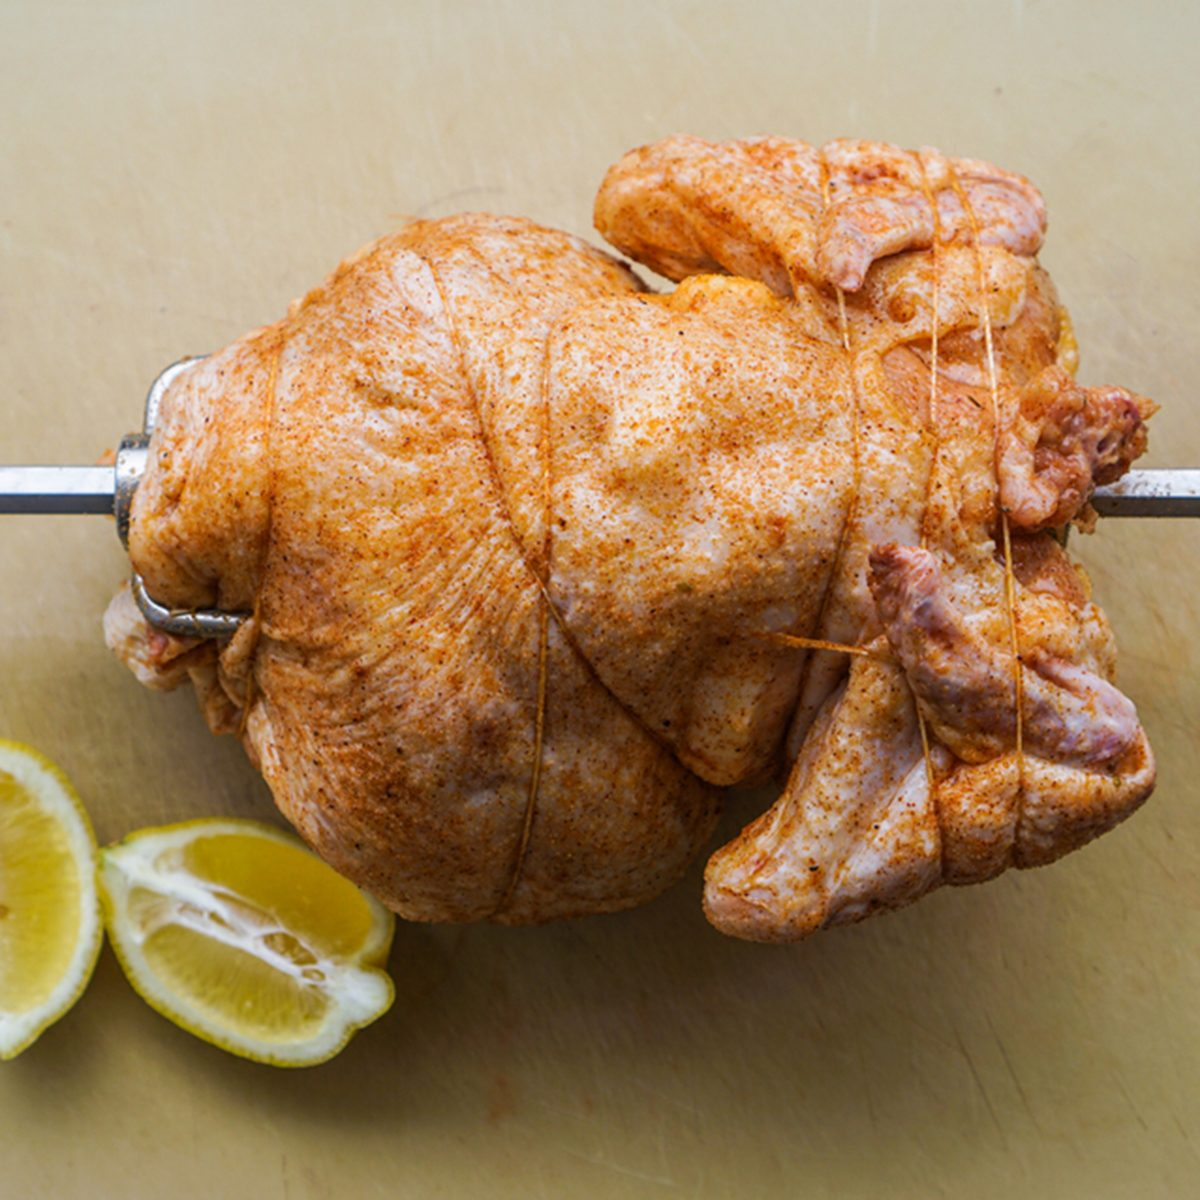 rotisserie chicken on the grill/preparation